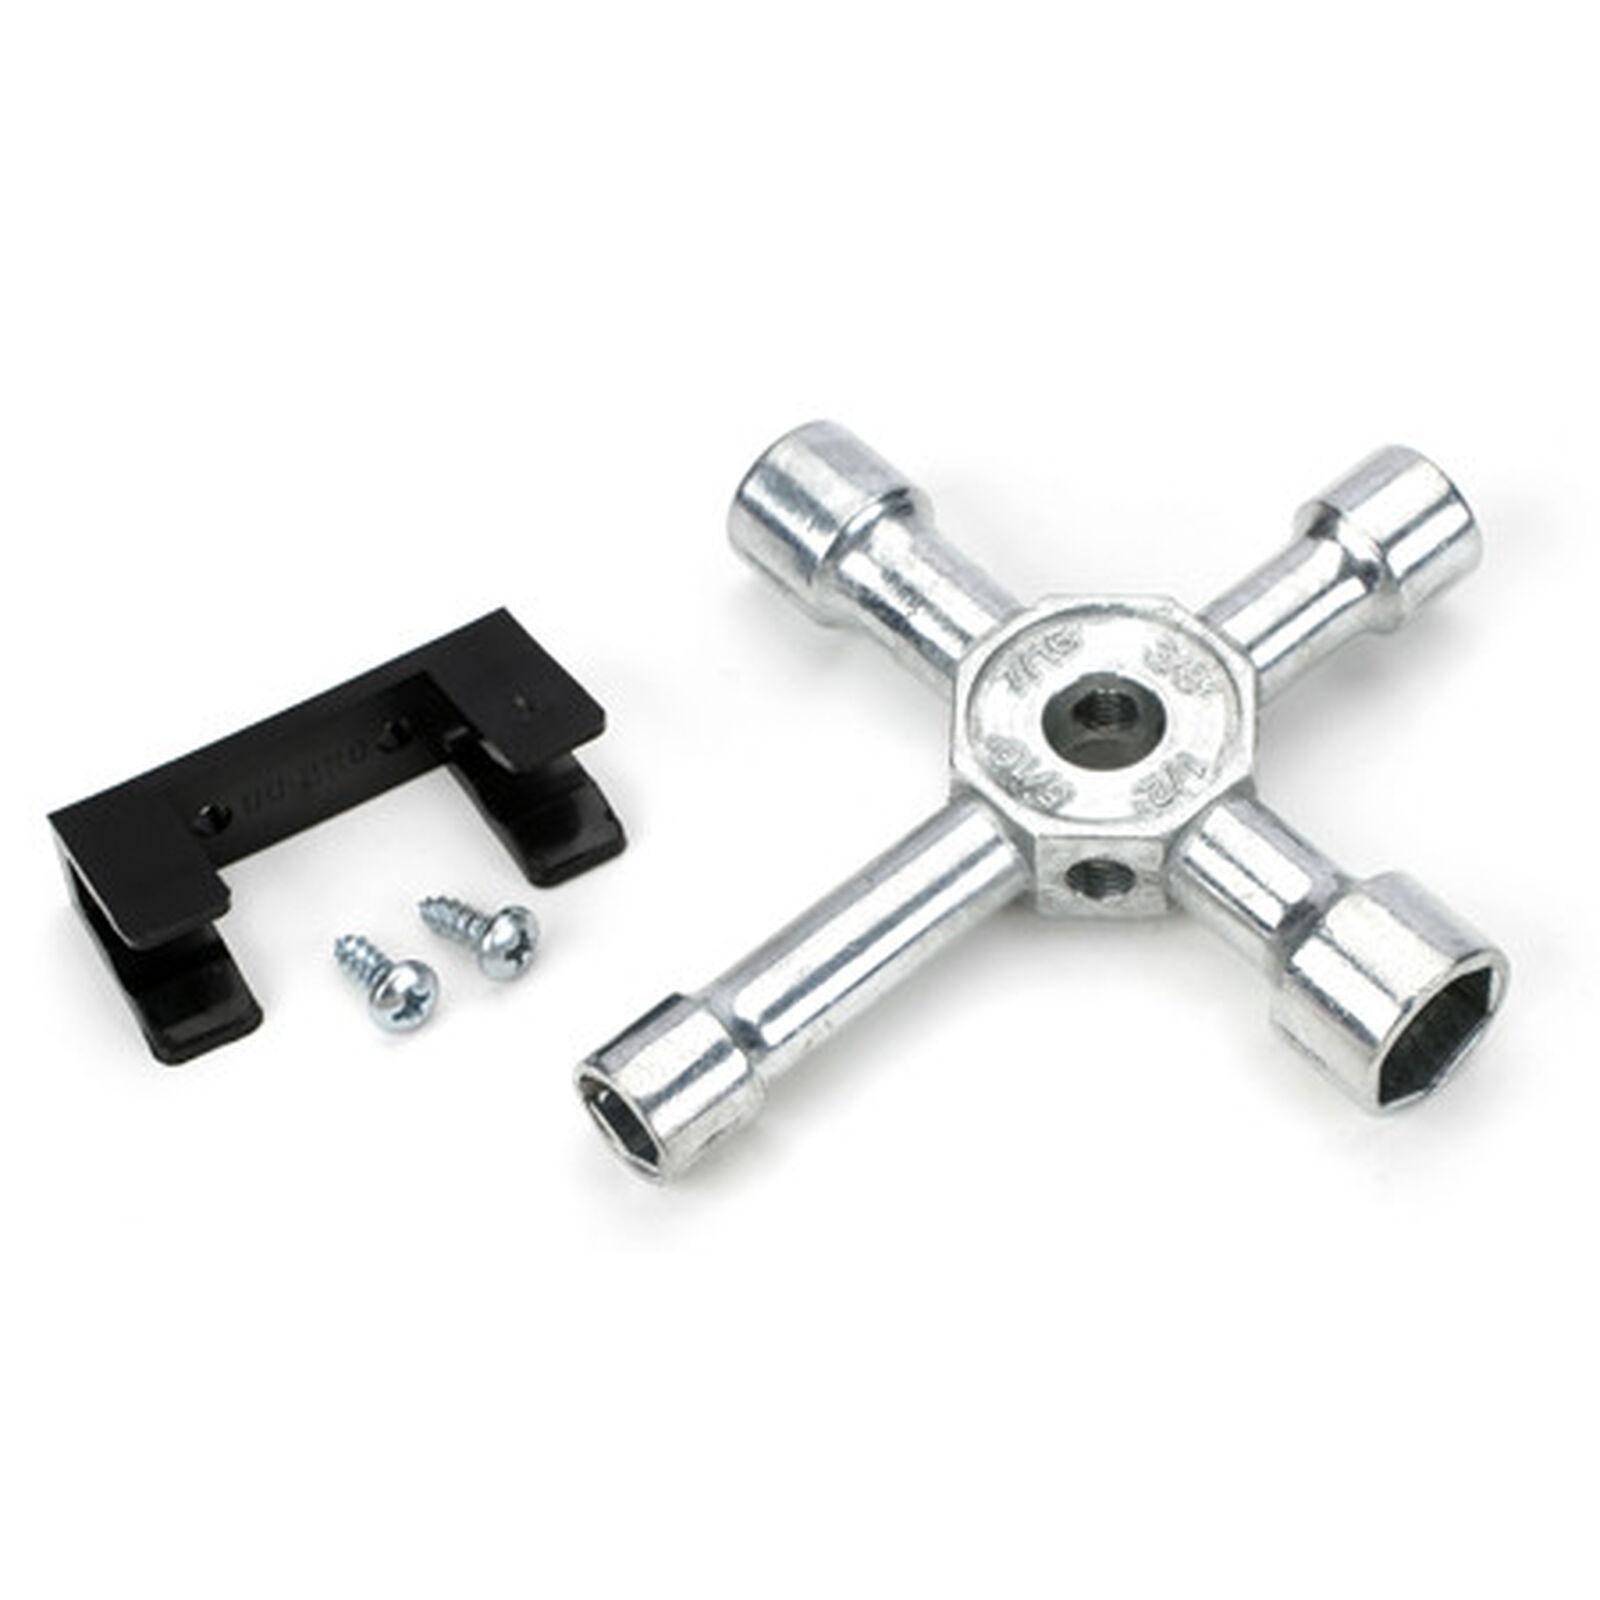 Socket Wrench 4-Way